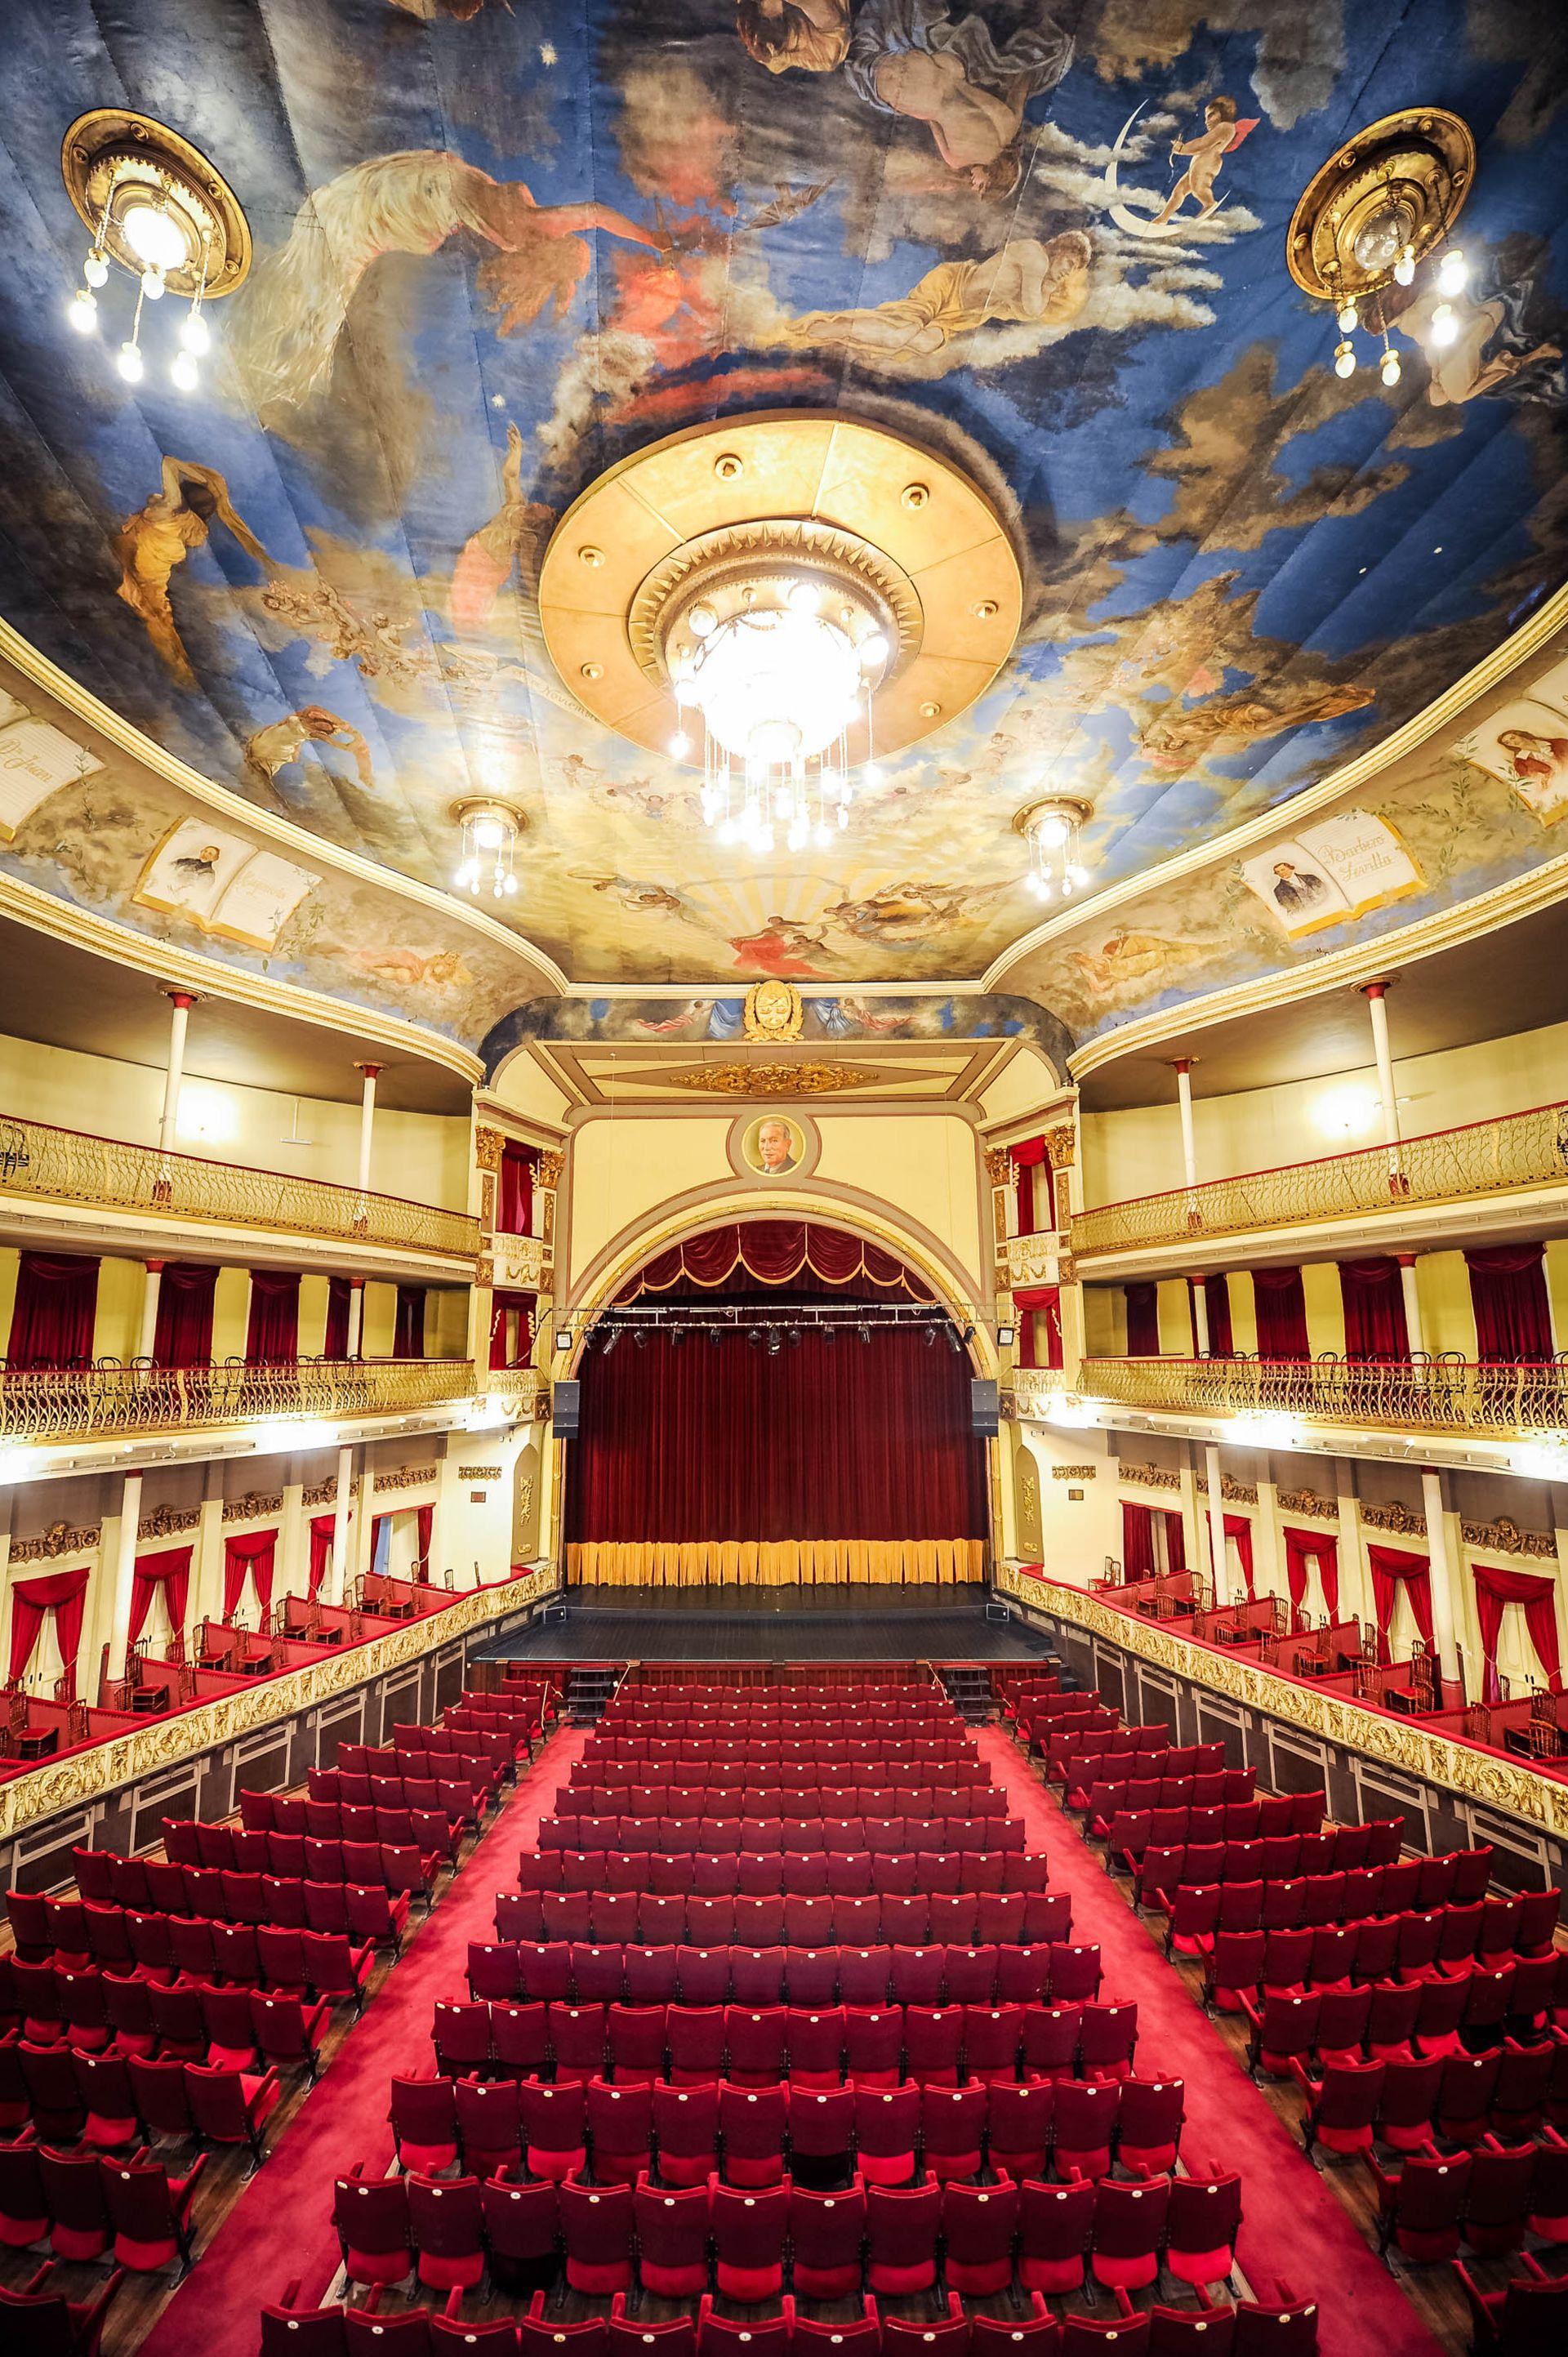 Teatro Municipal Coliseo Podestá de La Plata